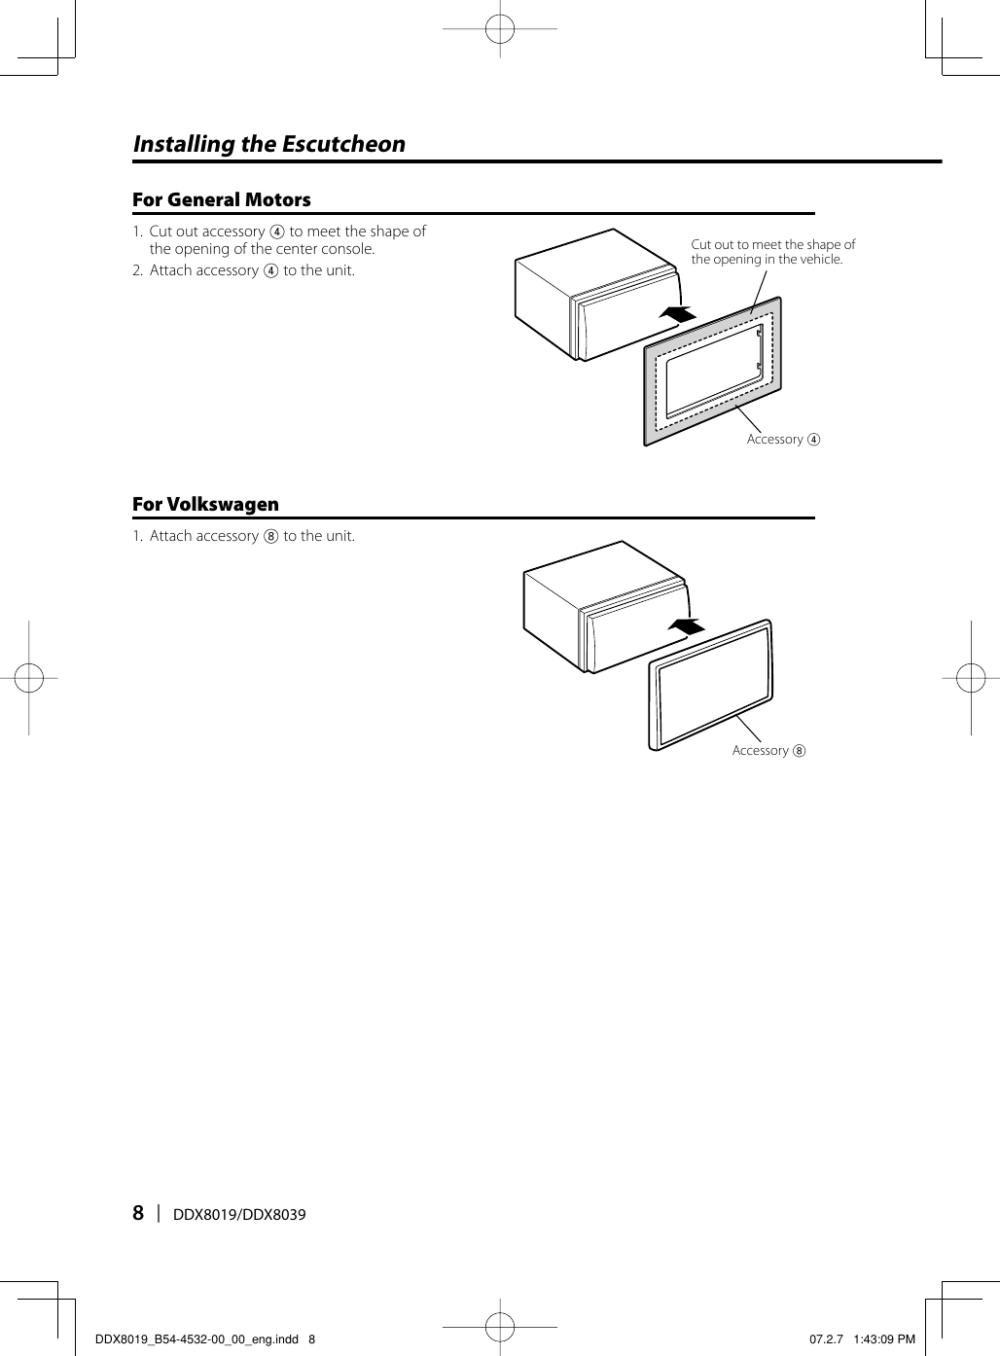 medium resolution of page 8 of 12 kenwood kenwood excelon ddx8019 users manual